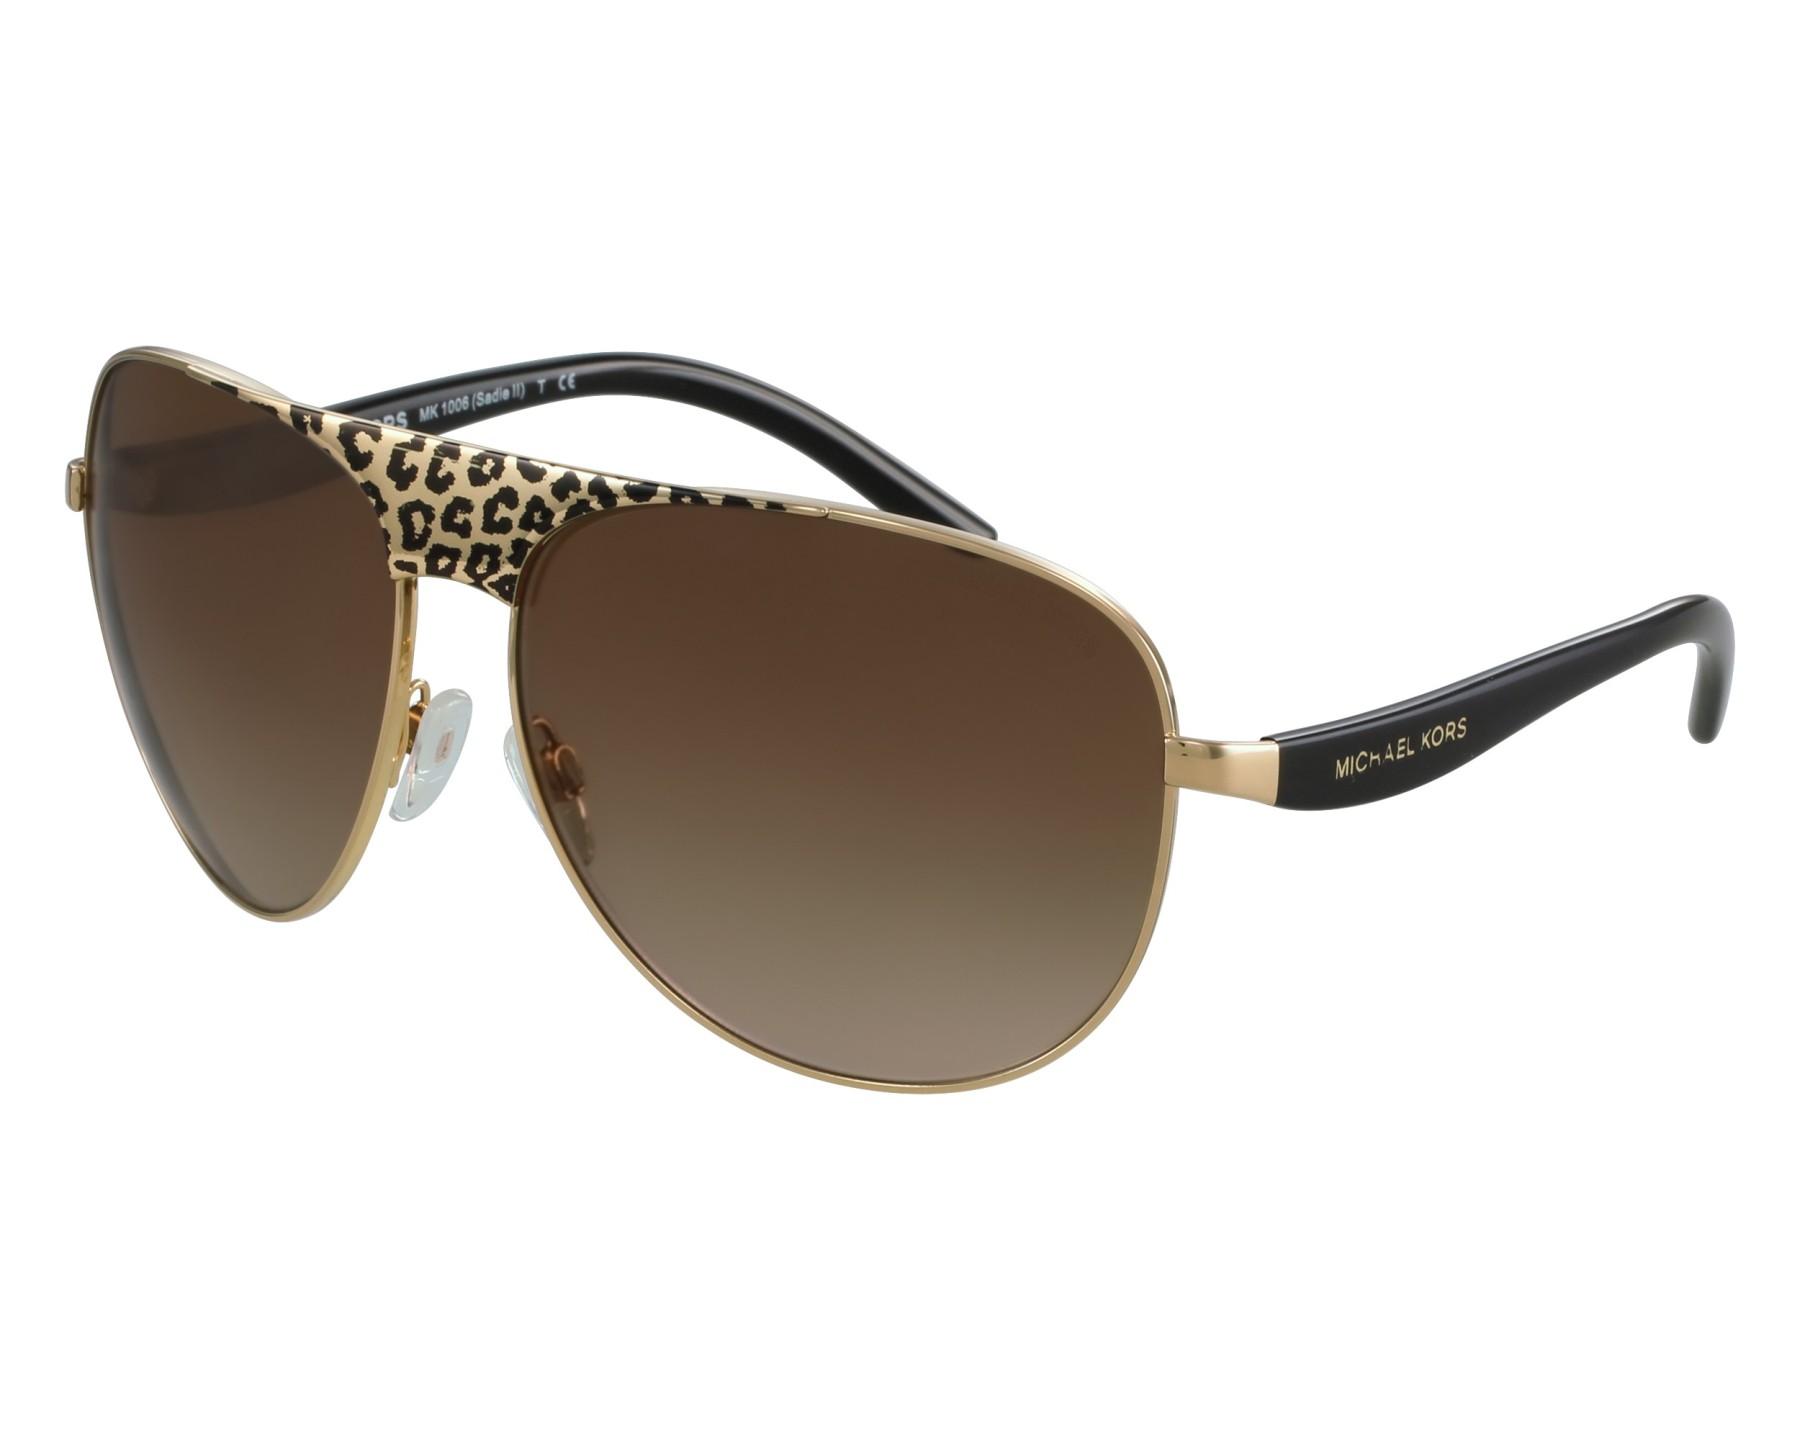 Sunglasses Michael Kors MK-1006 105713 62-14 Gold Leo front view 17b4abc61102